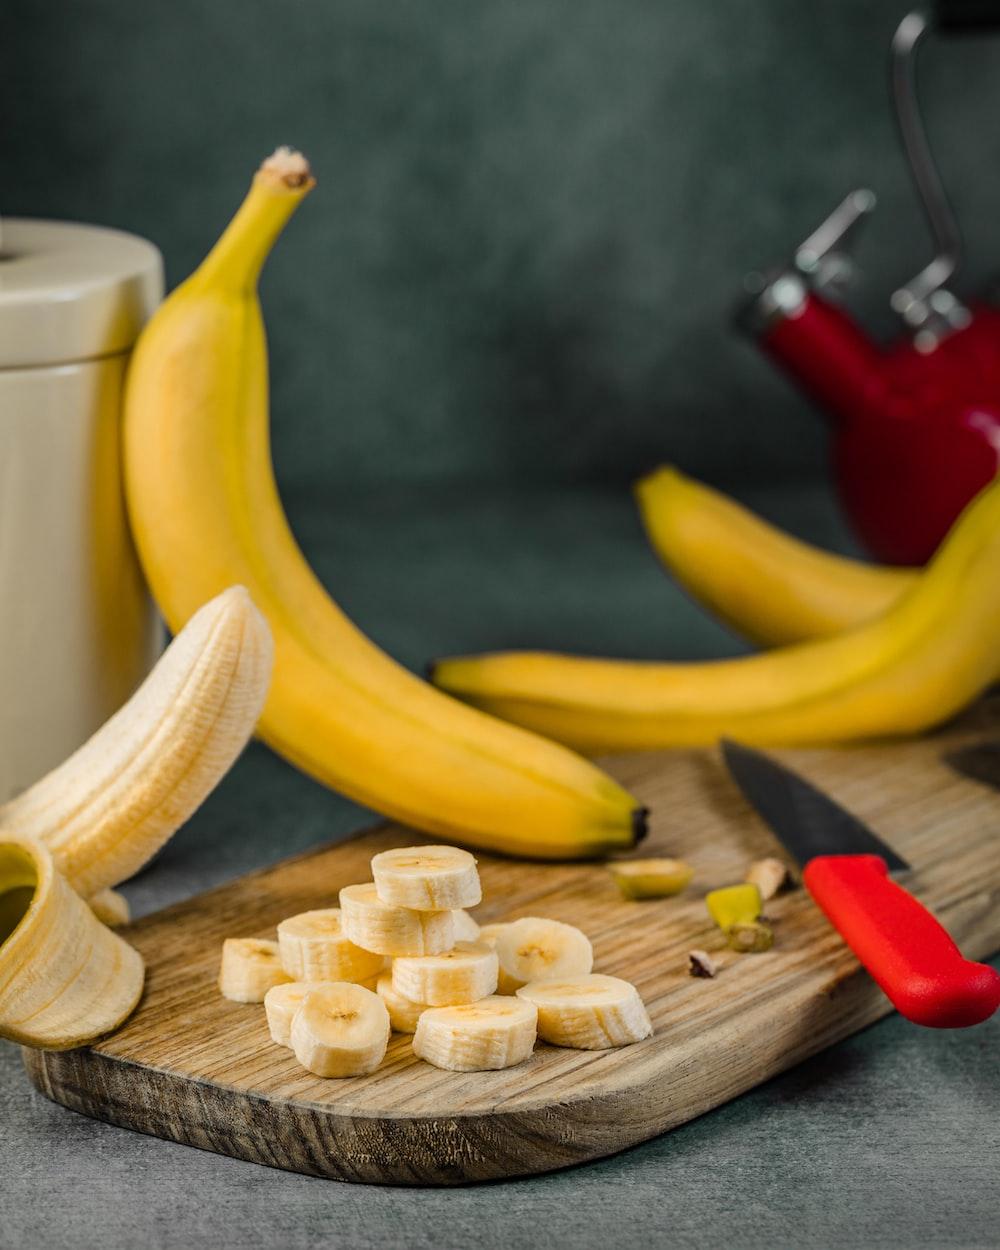 yellow banana fruit on brown wooden chopping board